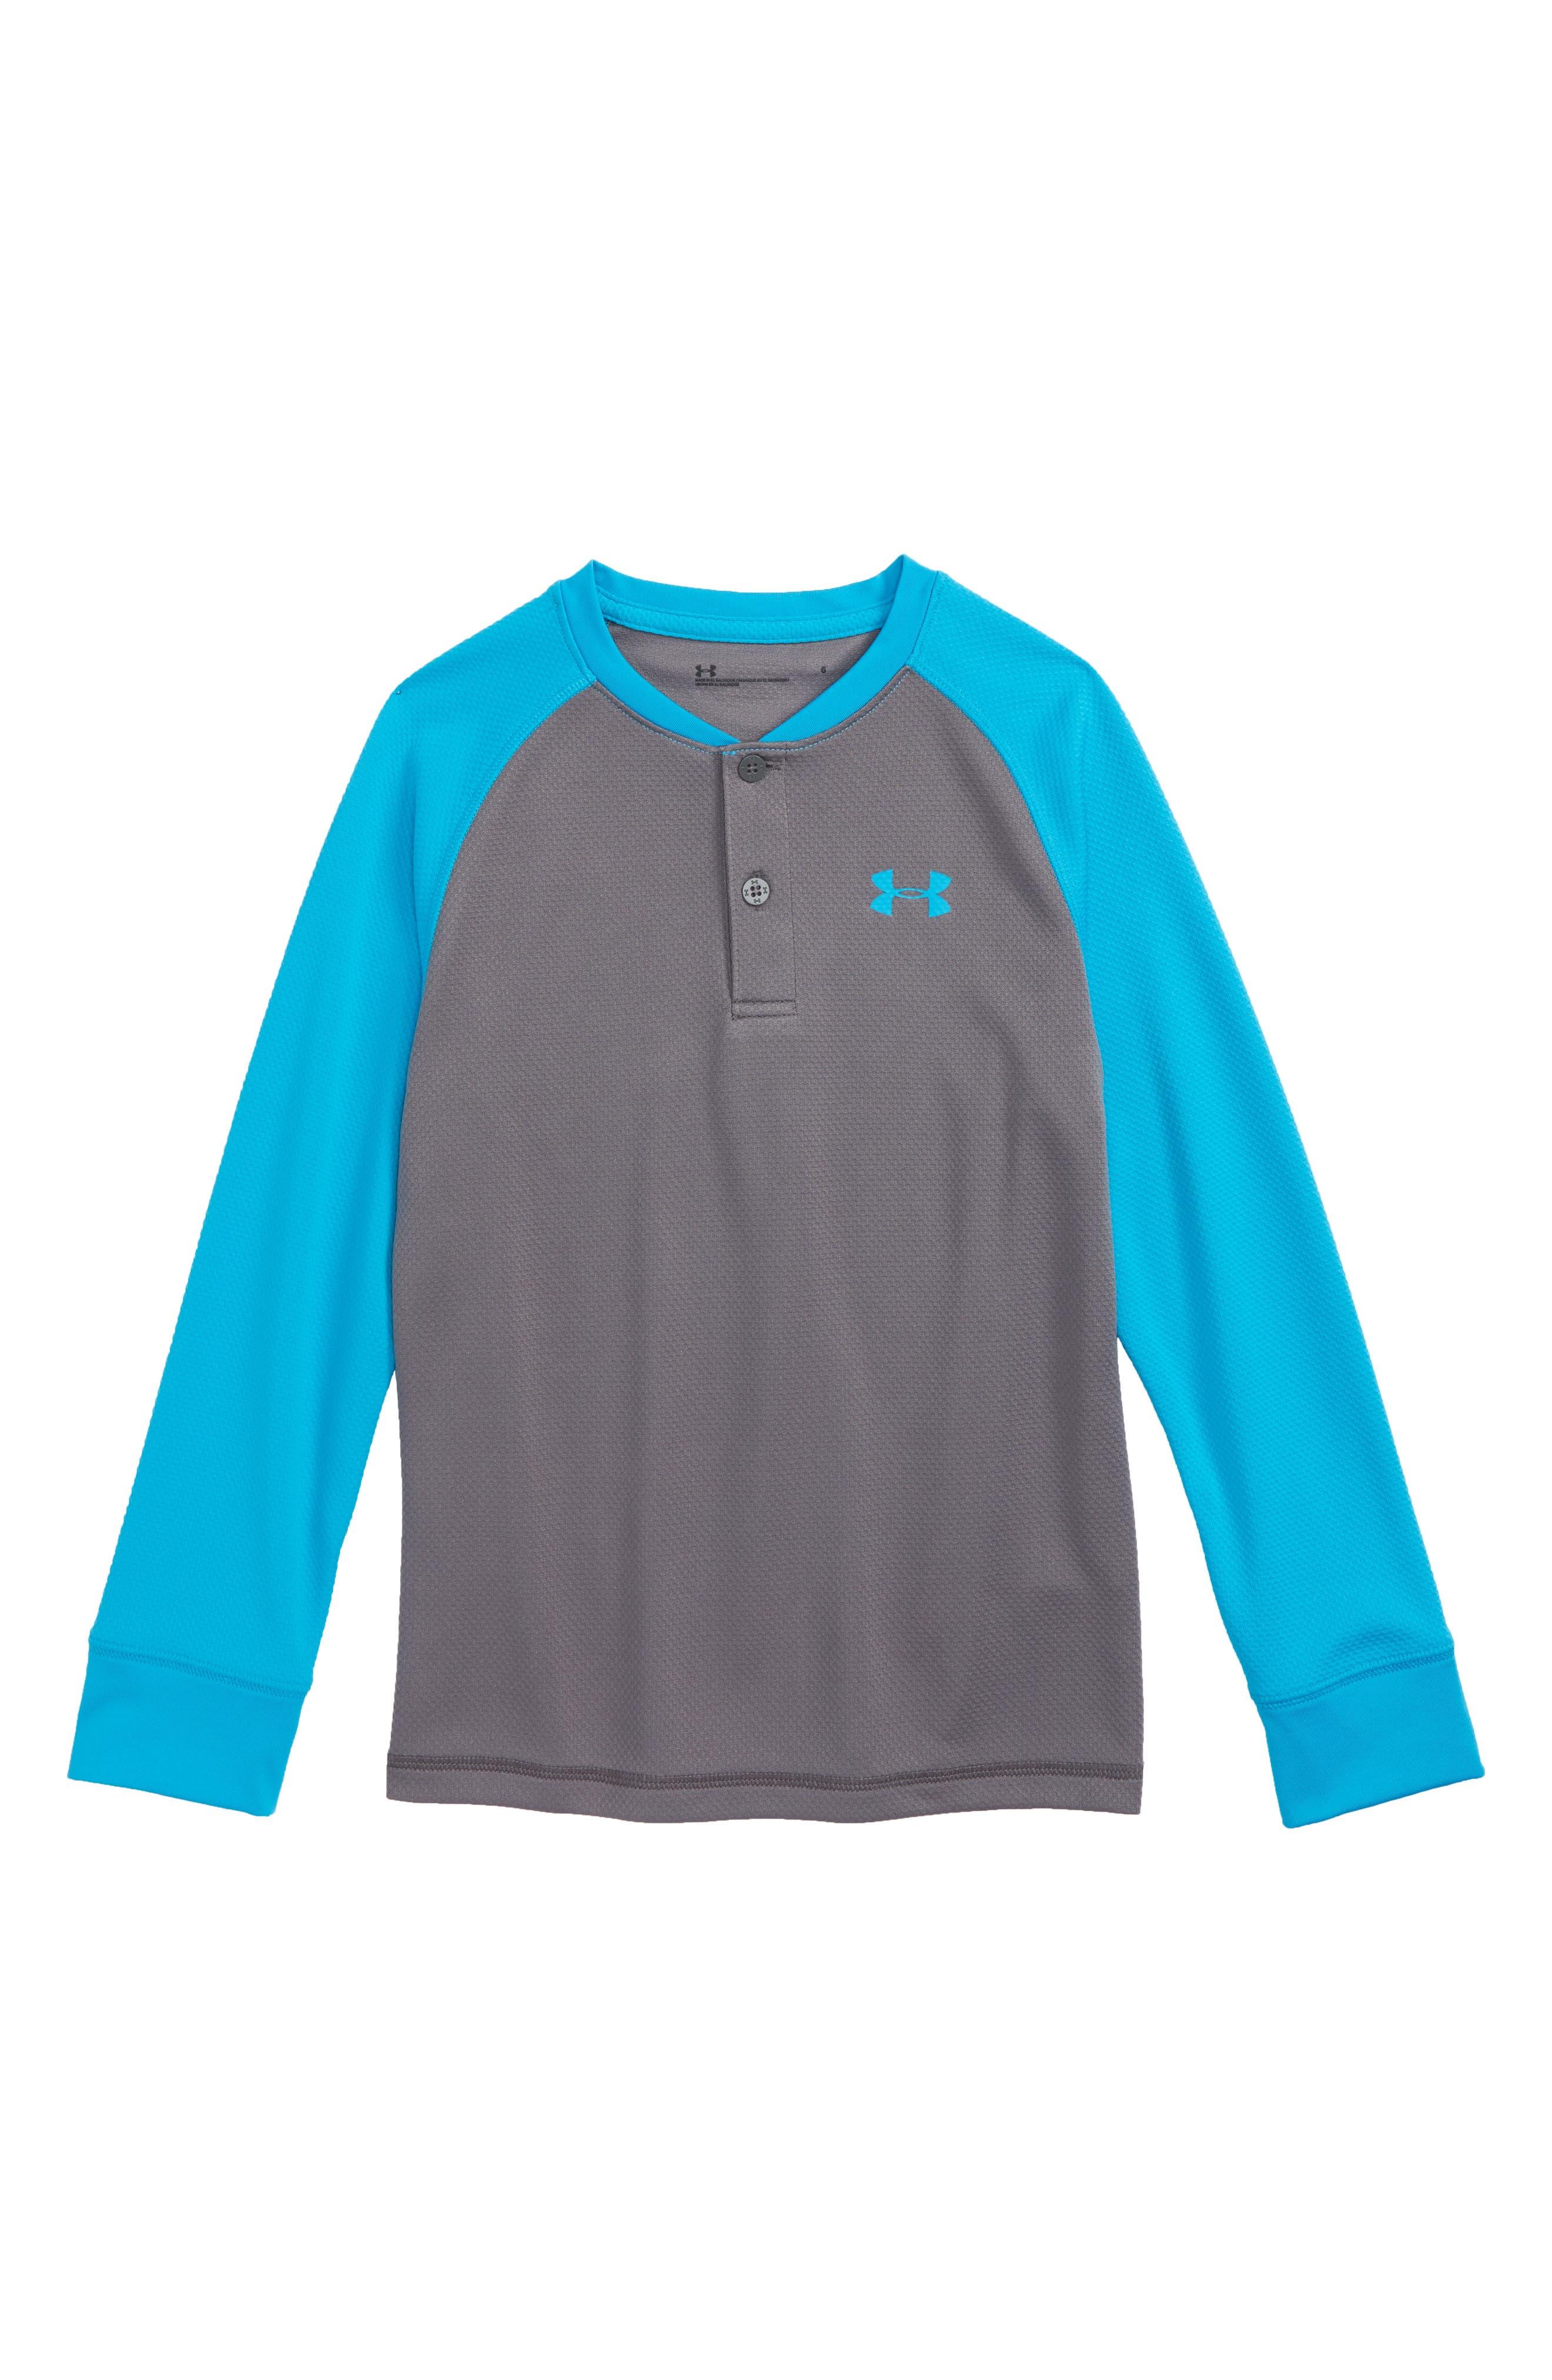 Henley T-Shirt,                             Main thumbnail 1, color,                             020